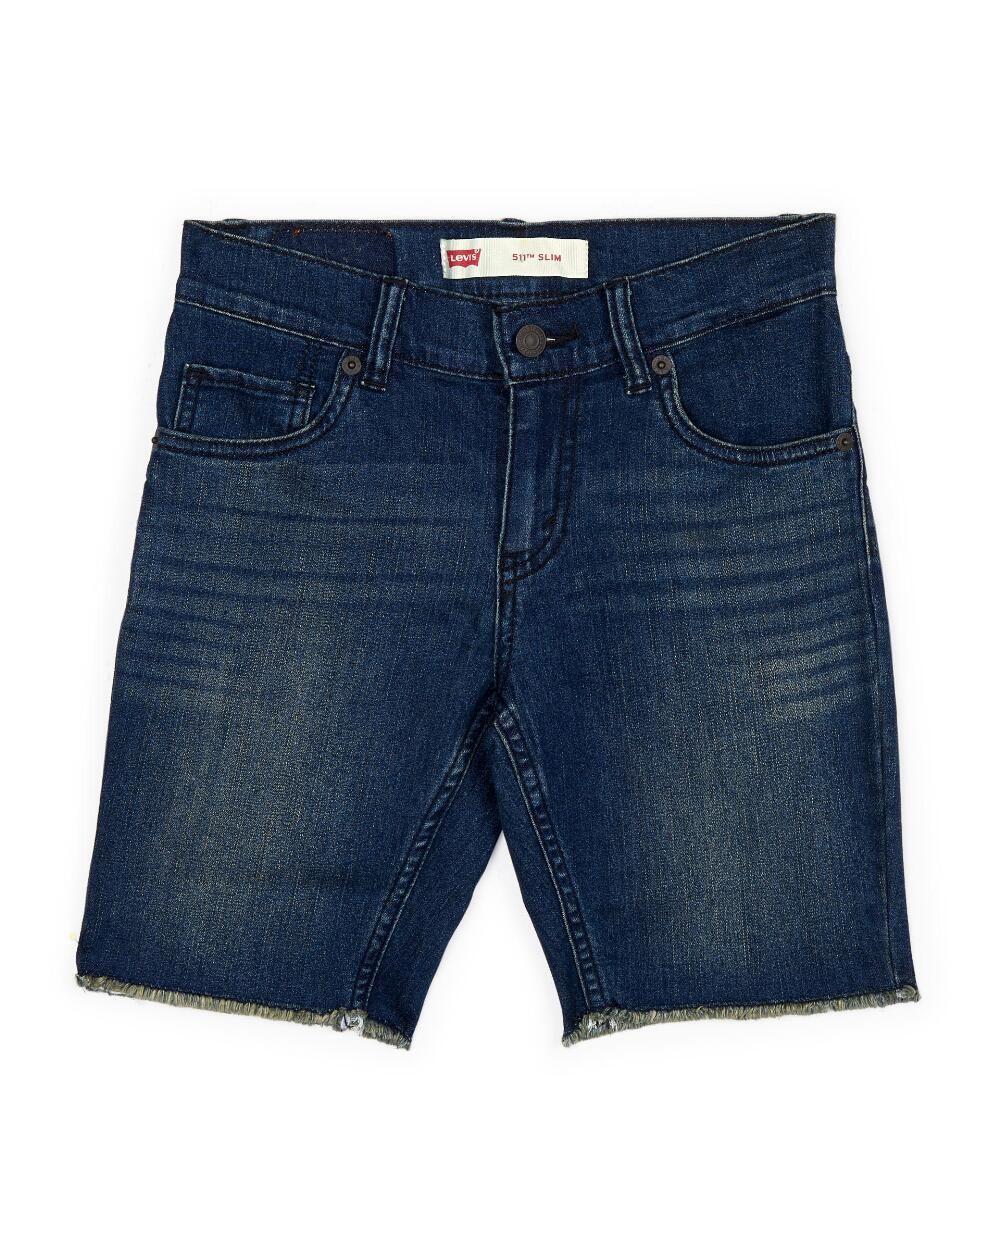 Boys 8-20 511 Slim Fit Cutoff Shorts #denimcutoffshorts